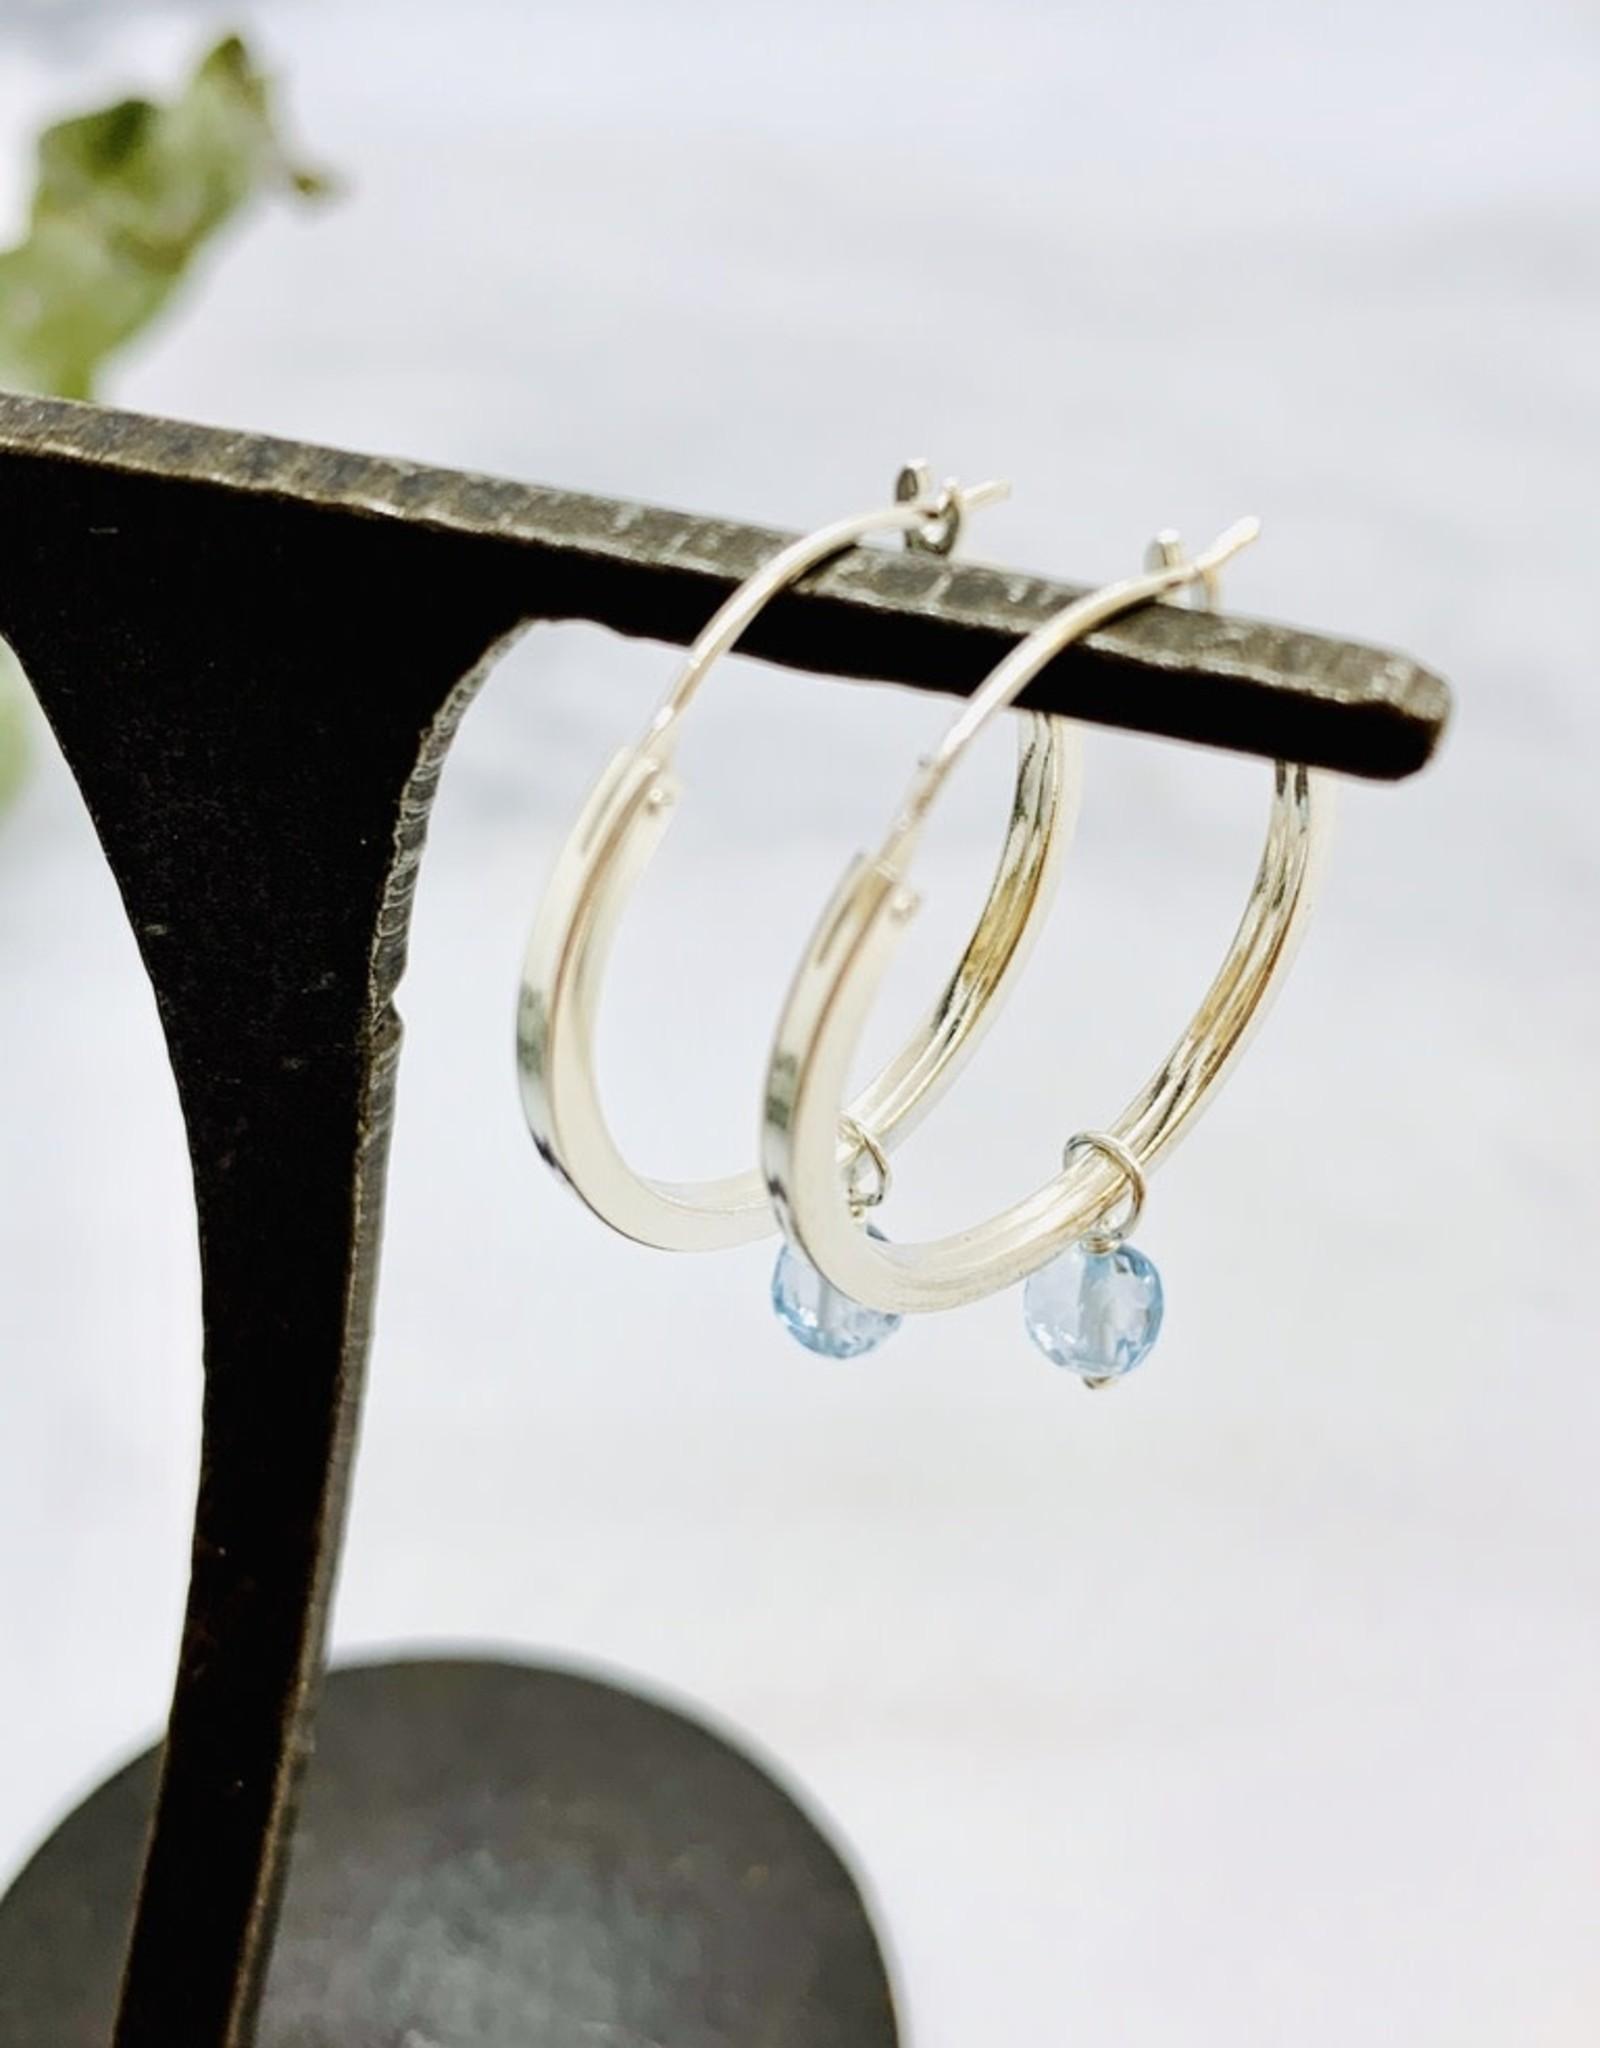 Handmade Silver Earrings with larger shiny hoop, sky blue topaz ball